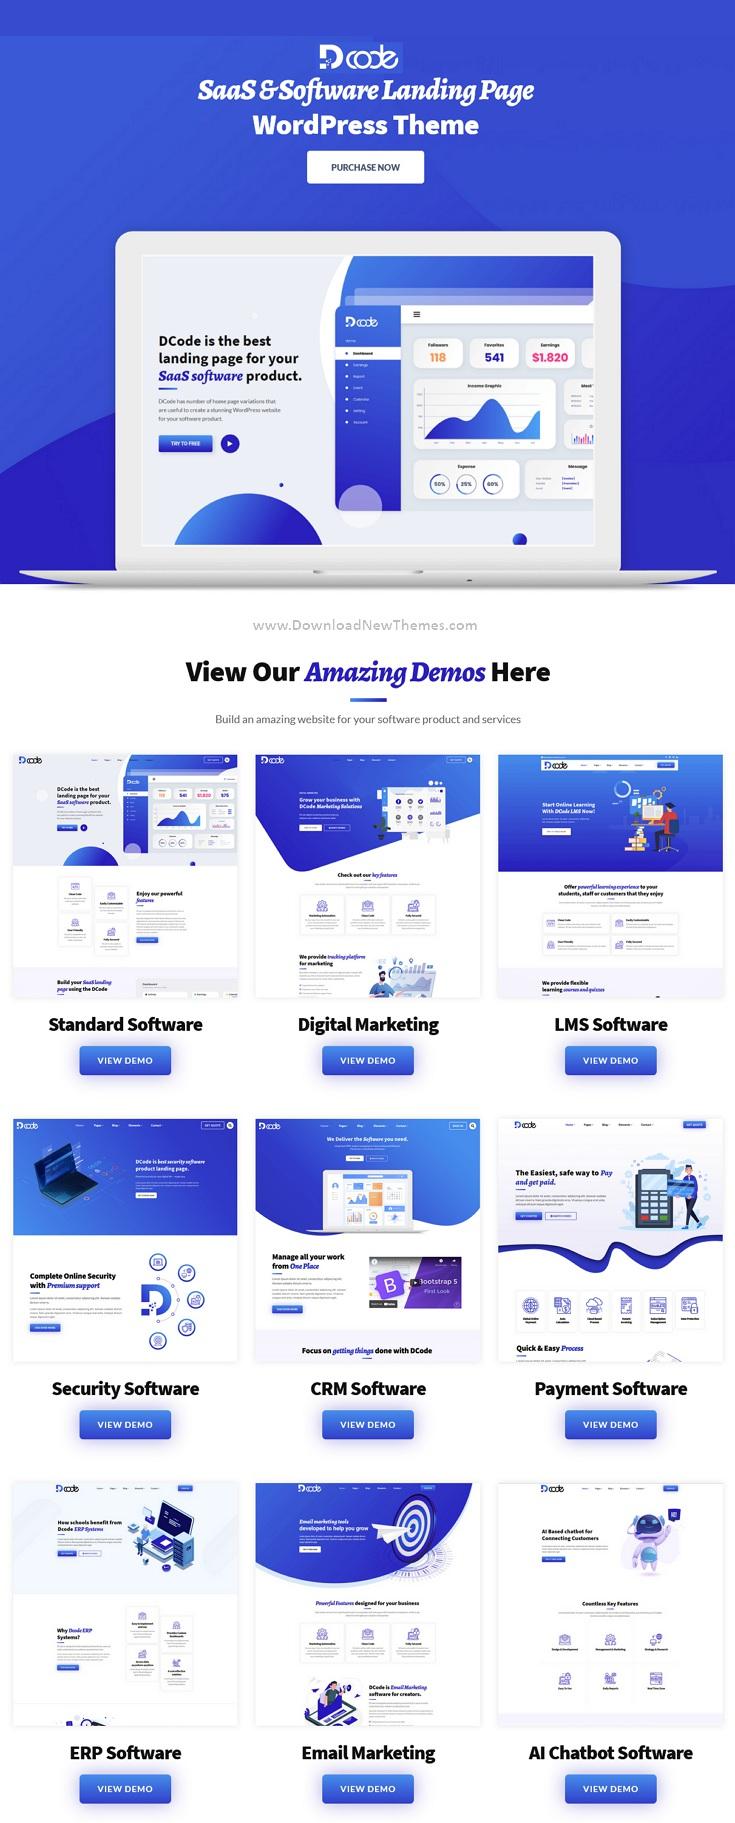 SaaS and Software Landing Page WordPress Theme